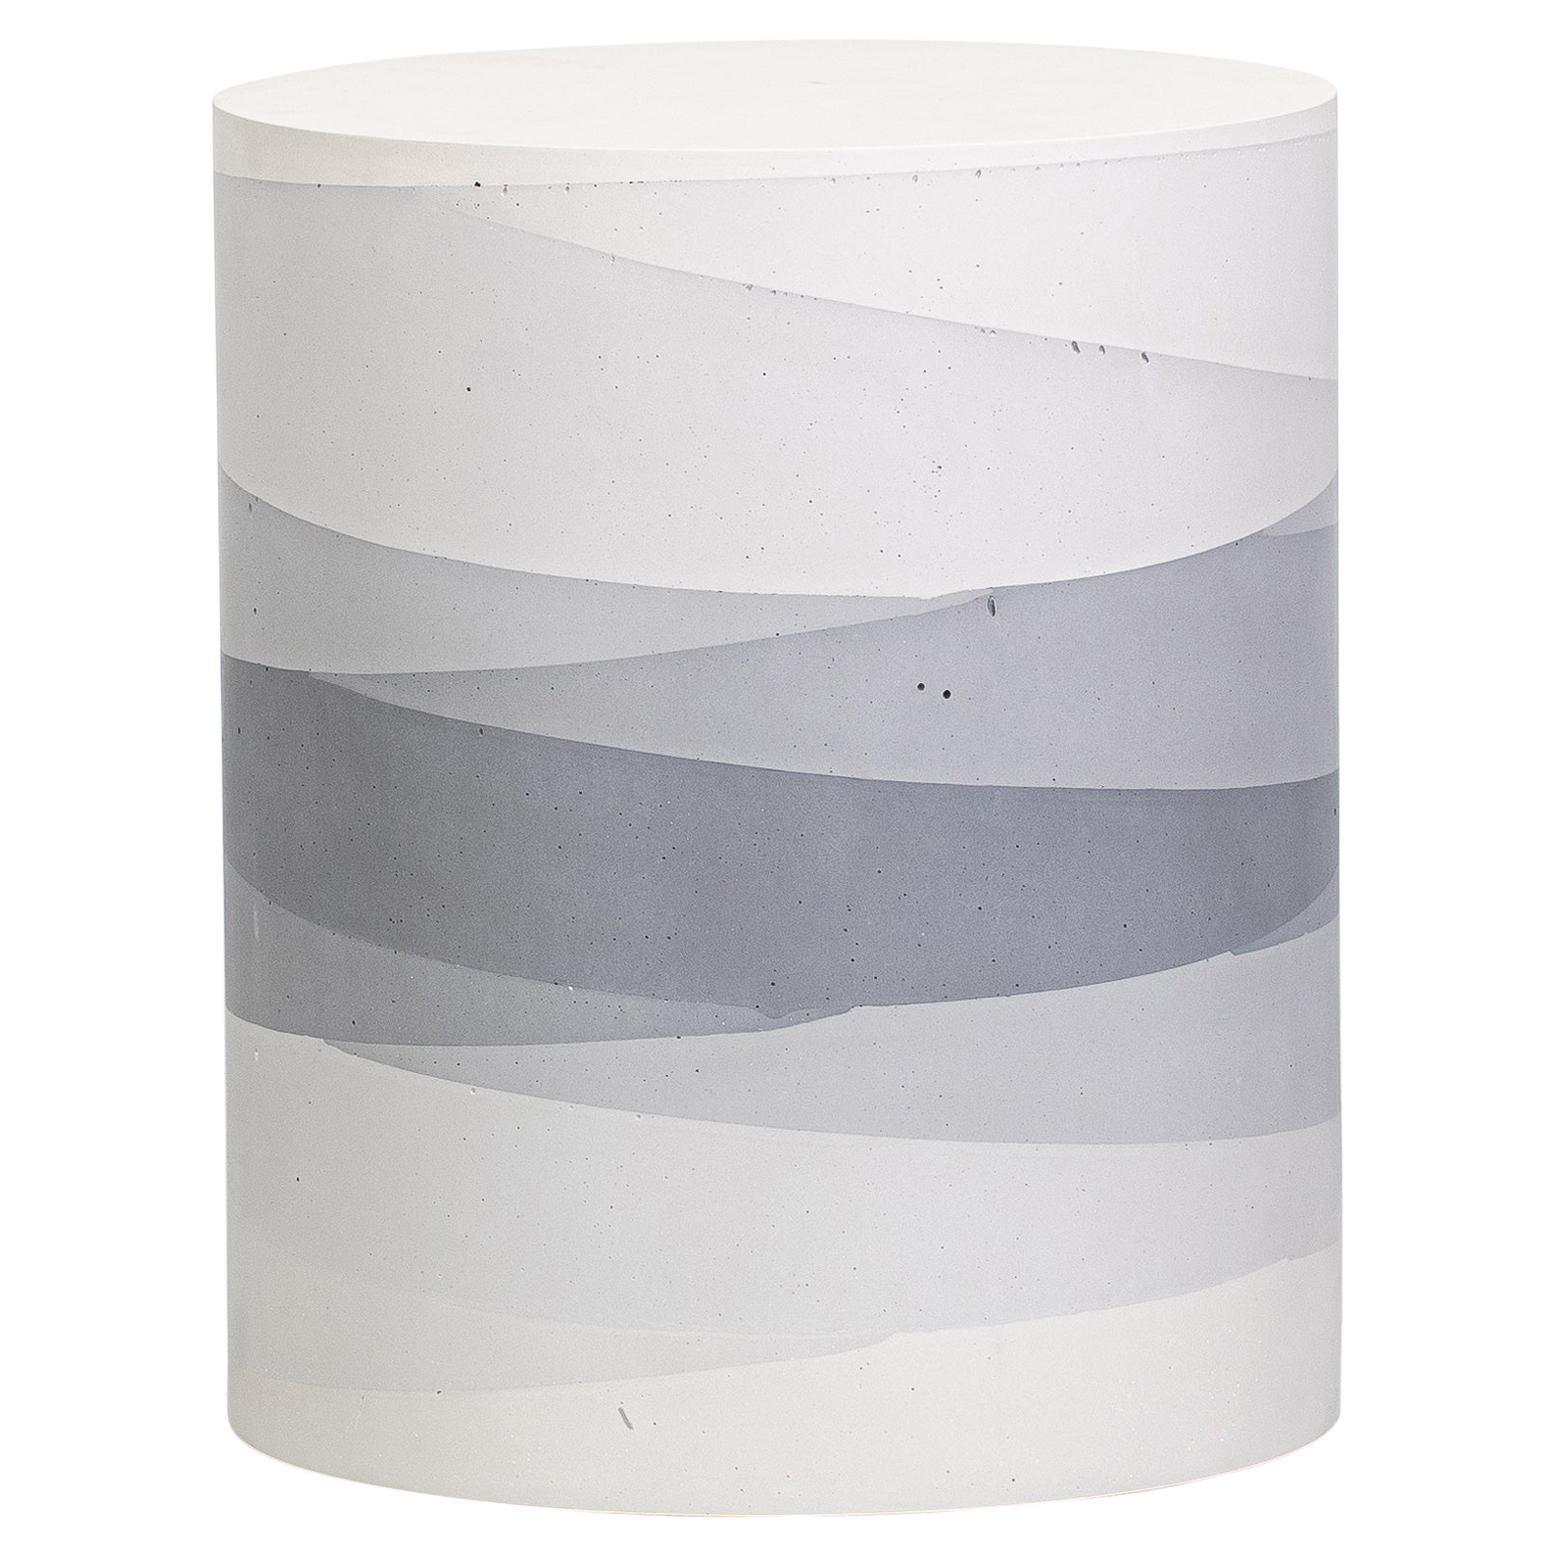 Fade Drum, Grey Cement by Fernando Mastrangelo, 1stDibs, New York